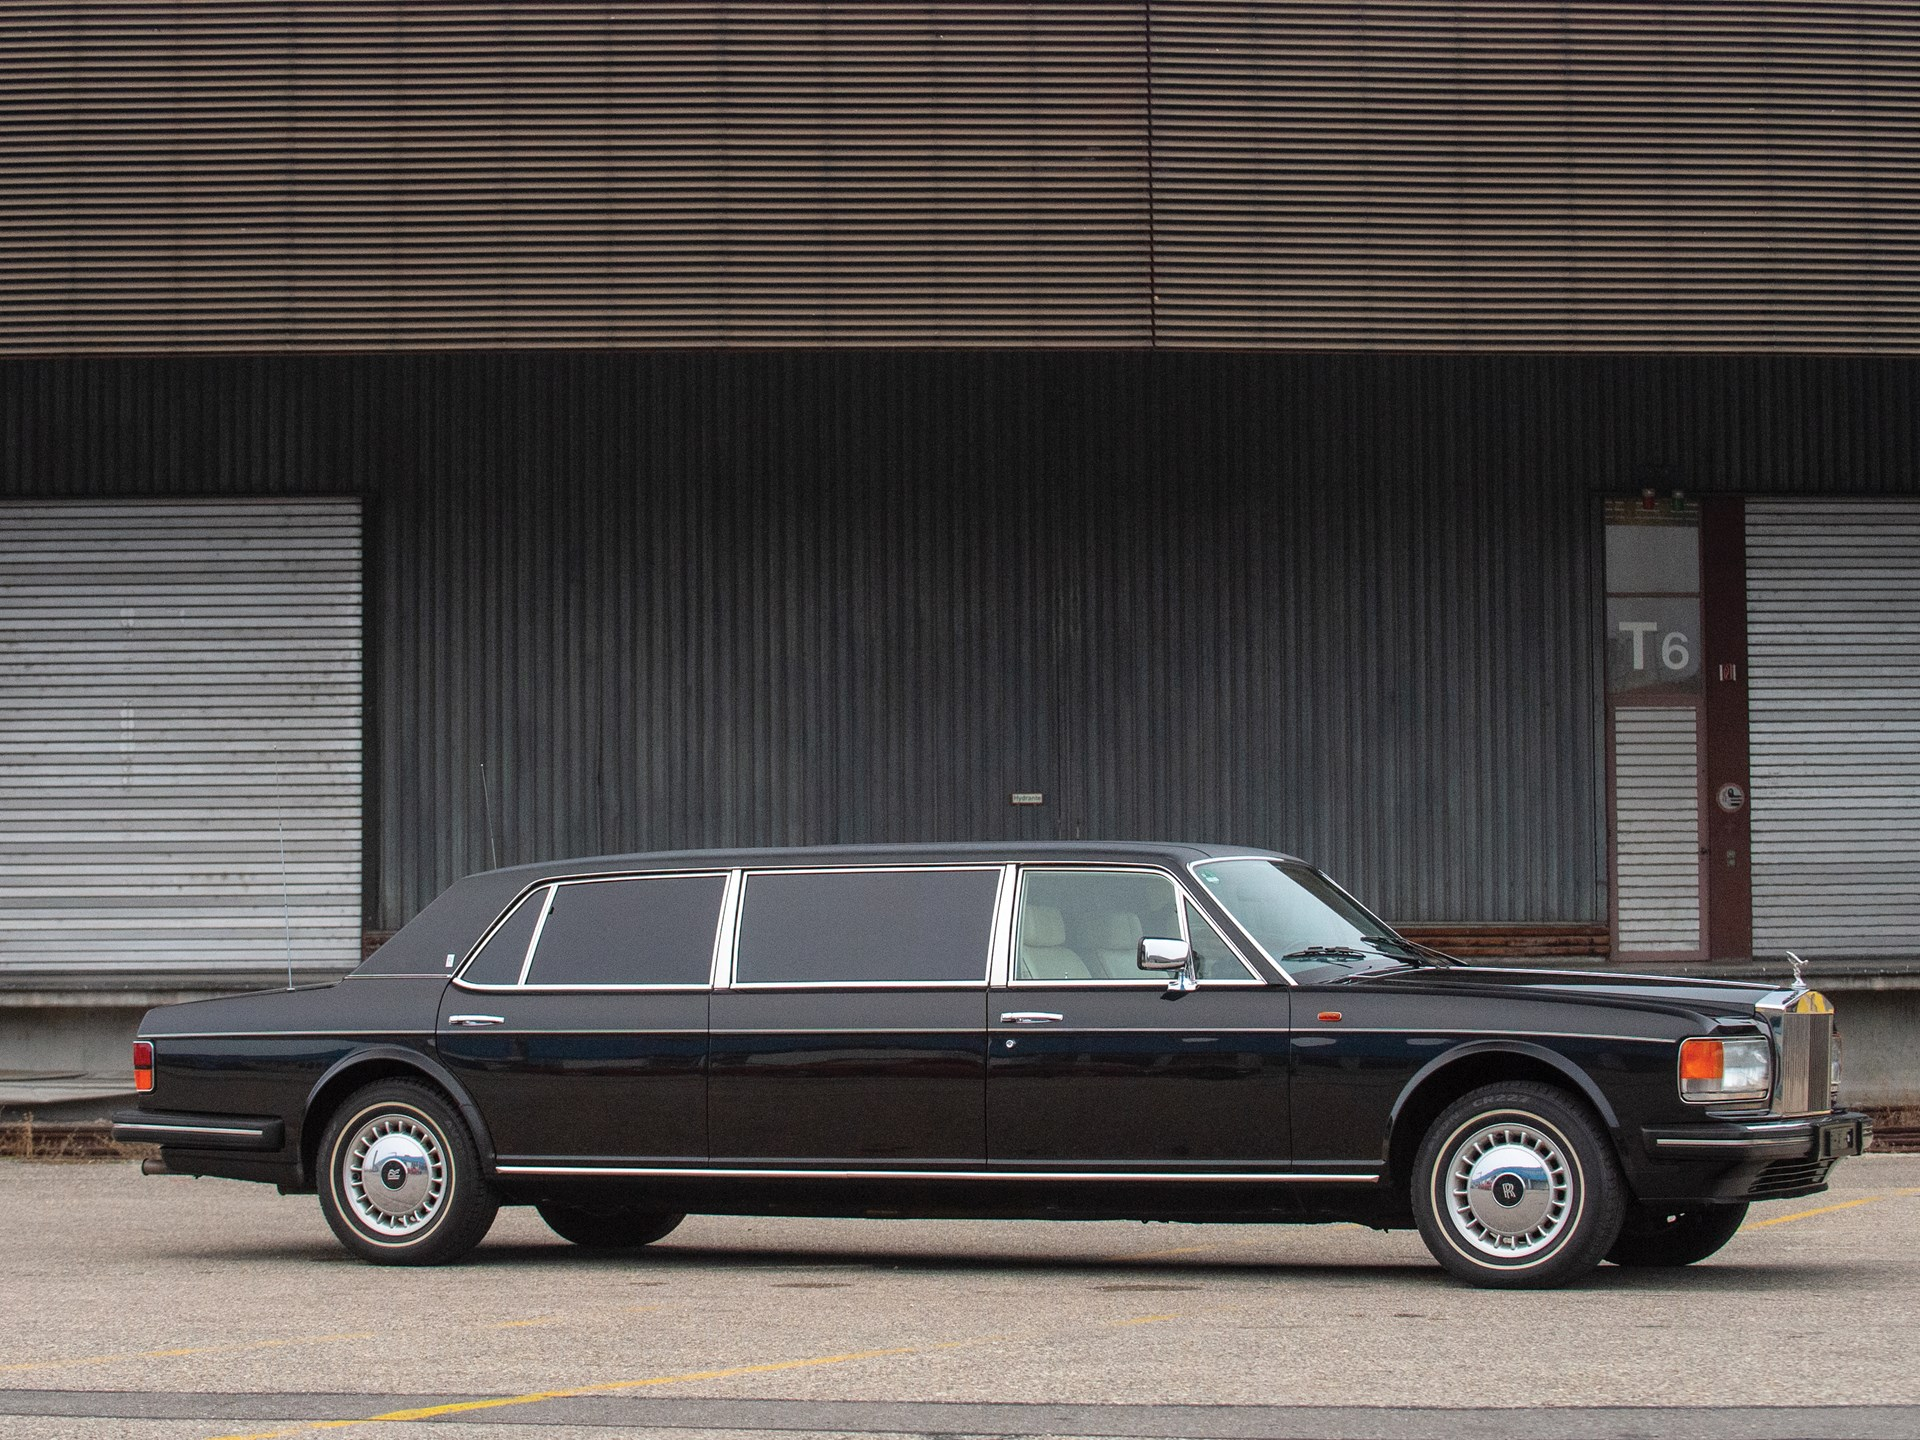 Rolls Royce Limo >> Rm Sotheby S 1987 Rolls Royce Silver Spur Limousine Essen 2019